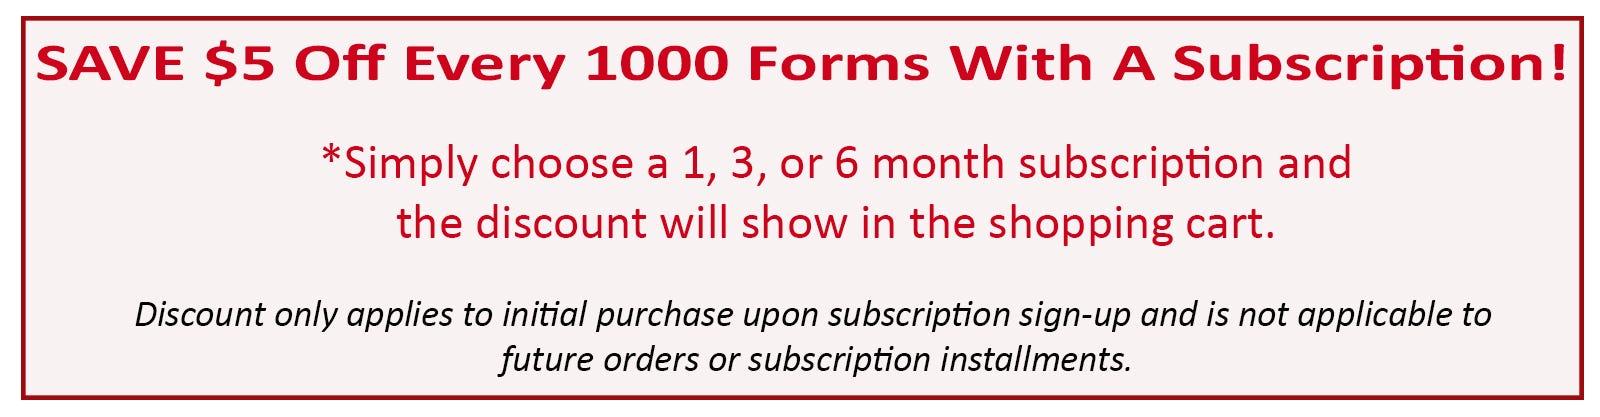 Dealermarket Subscriptions